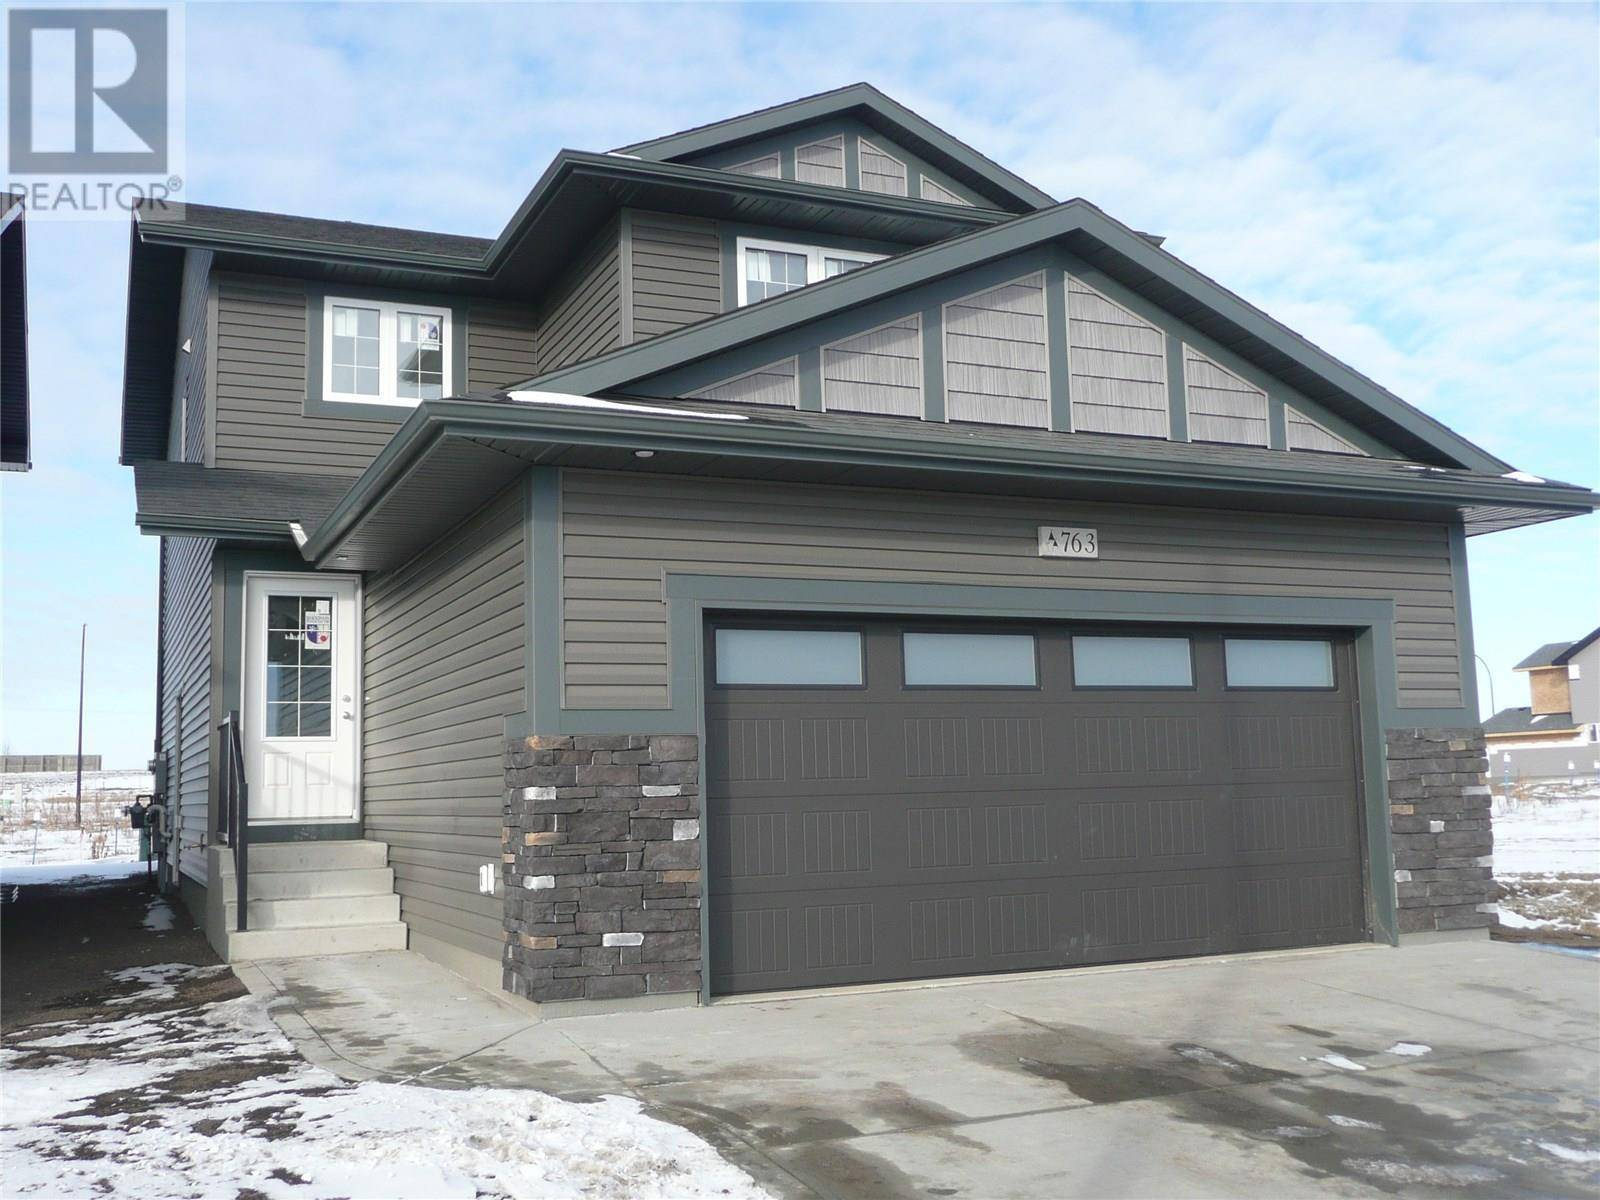 House for sale at 763 Mcfaull Ln Saskatoon Saskatchewan - MLS: SK792444